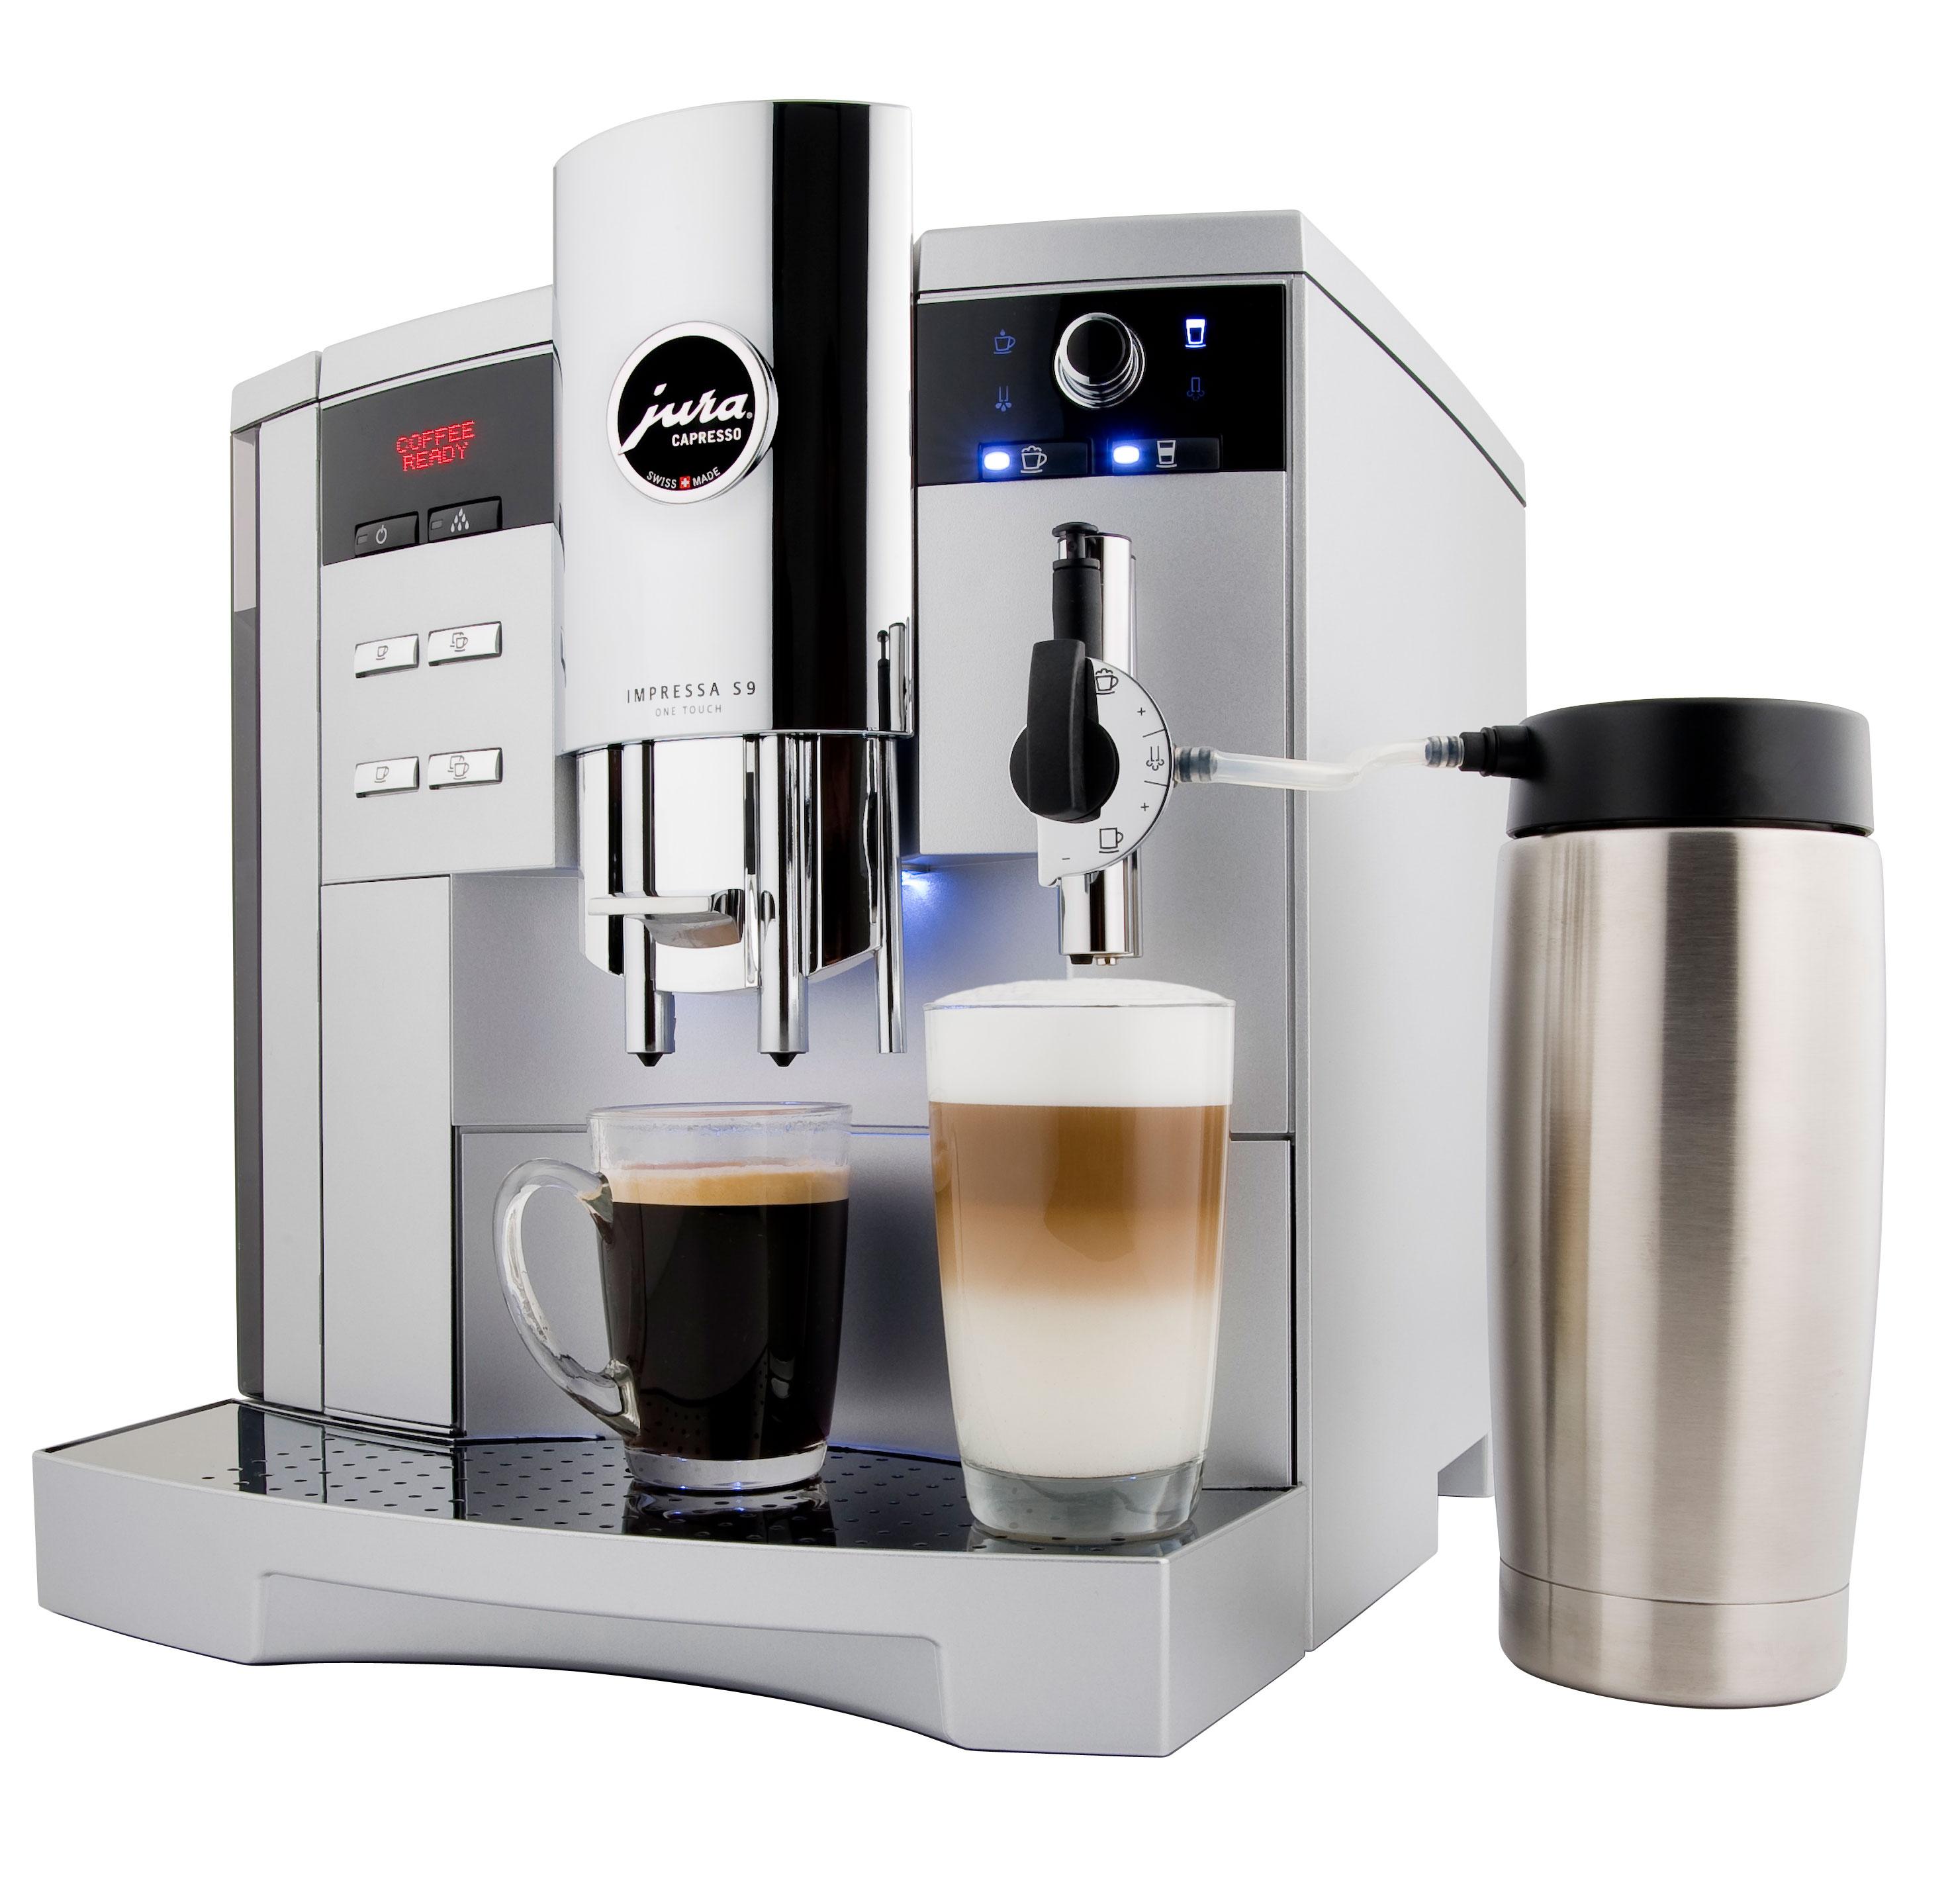 Jura Impressa S9 Classic Black One Touch Espresso Coffee Machine BRAND